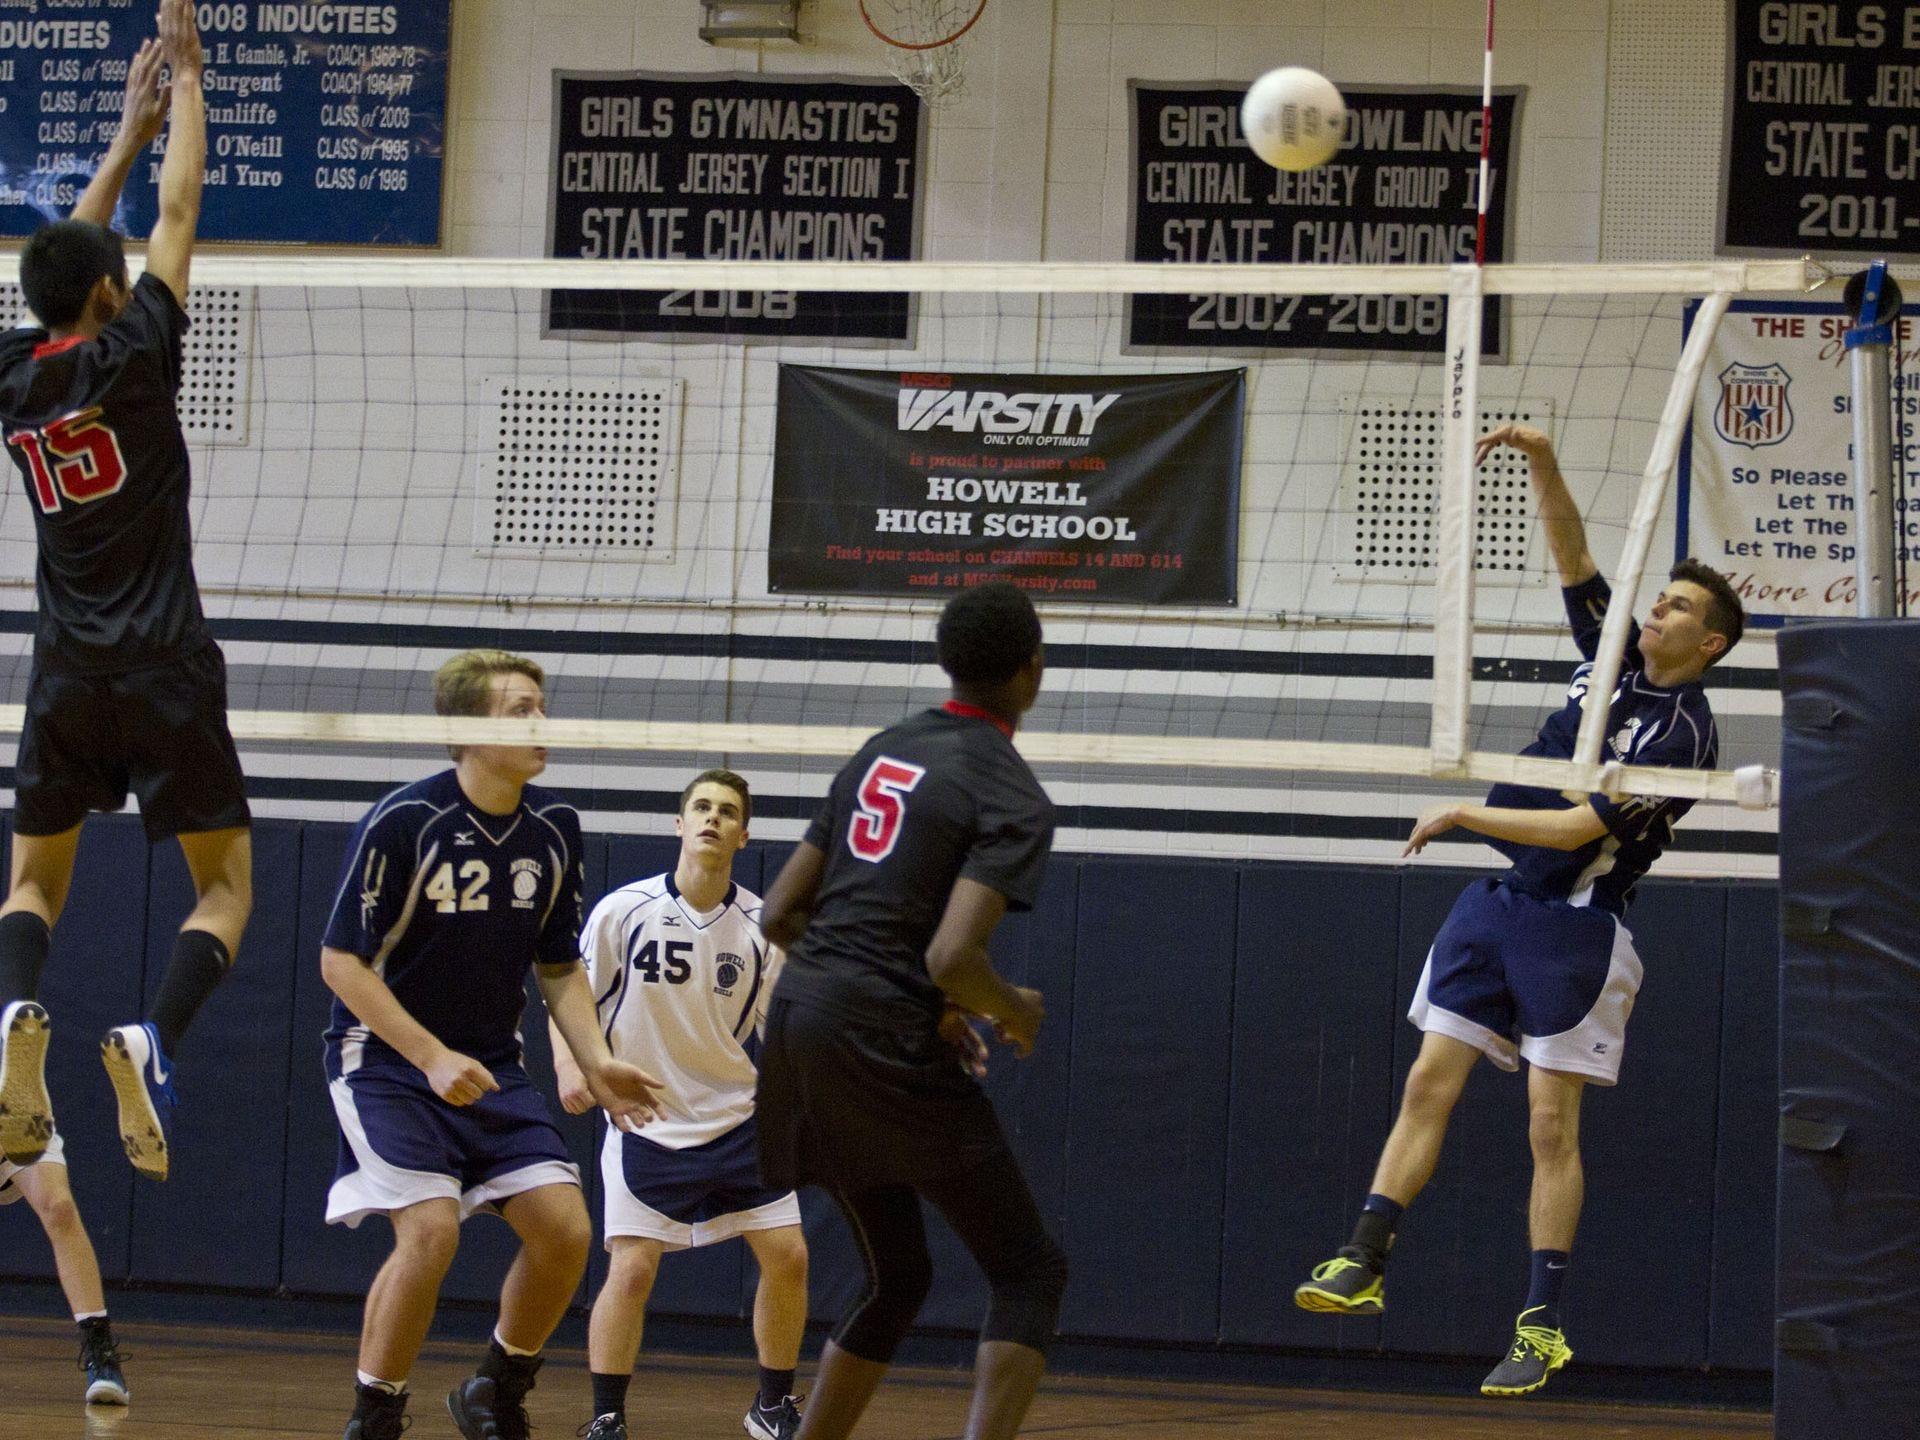 Boys volleyball